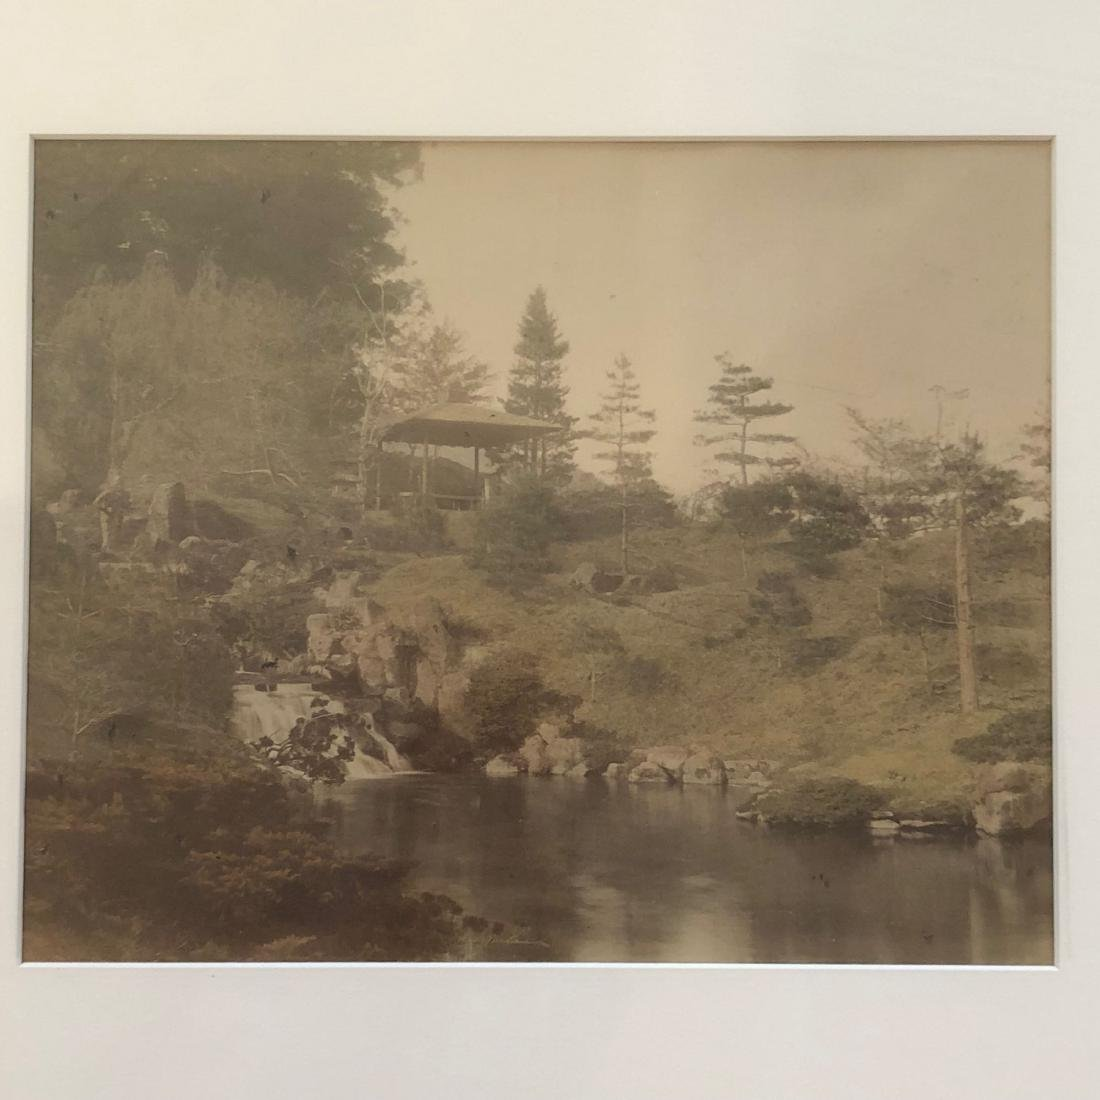 FOUR OF VINTAGE JAPANESE PHOTOS - 3